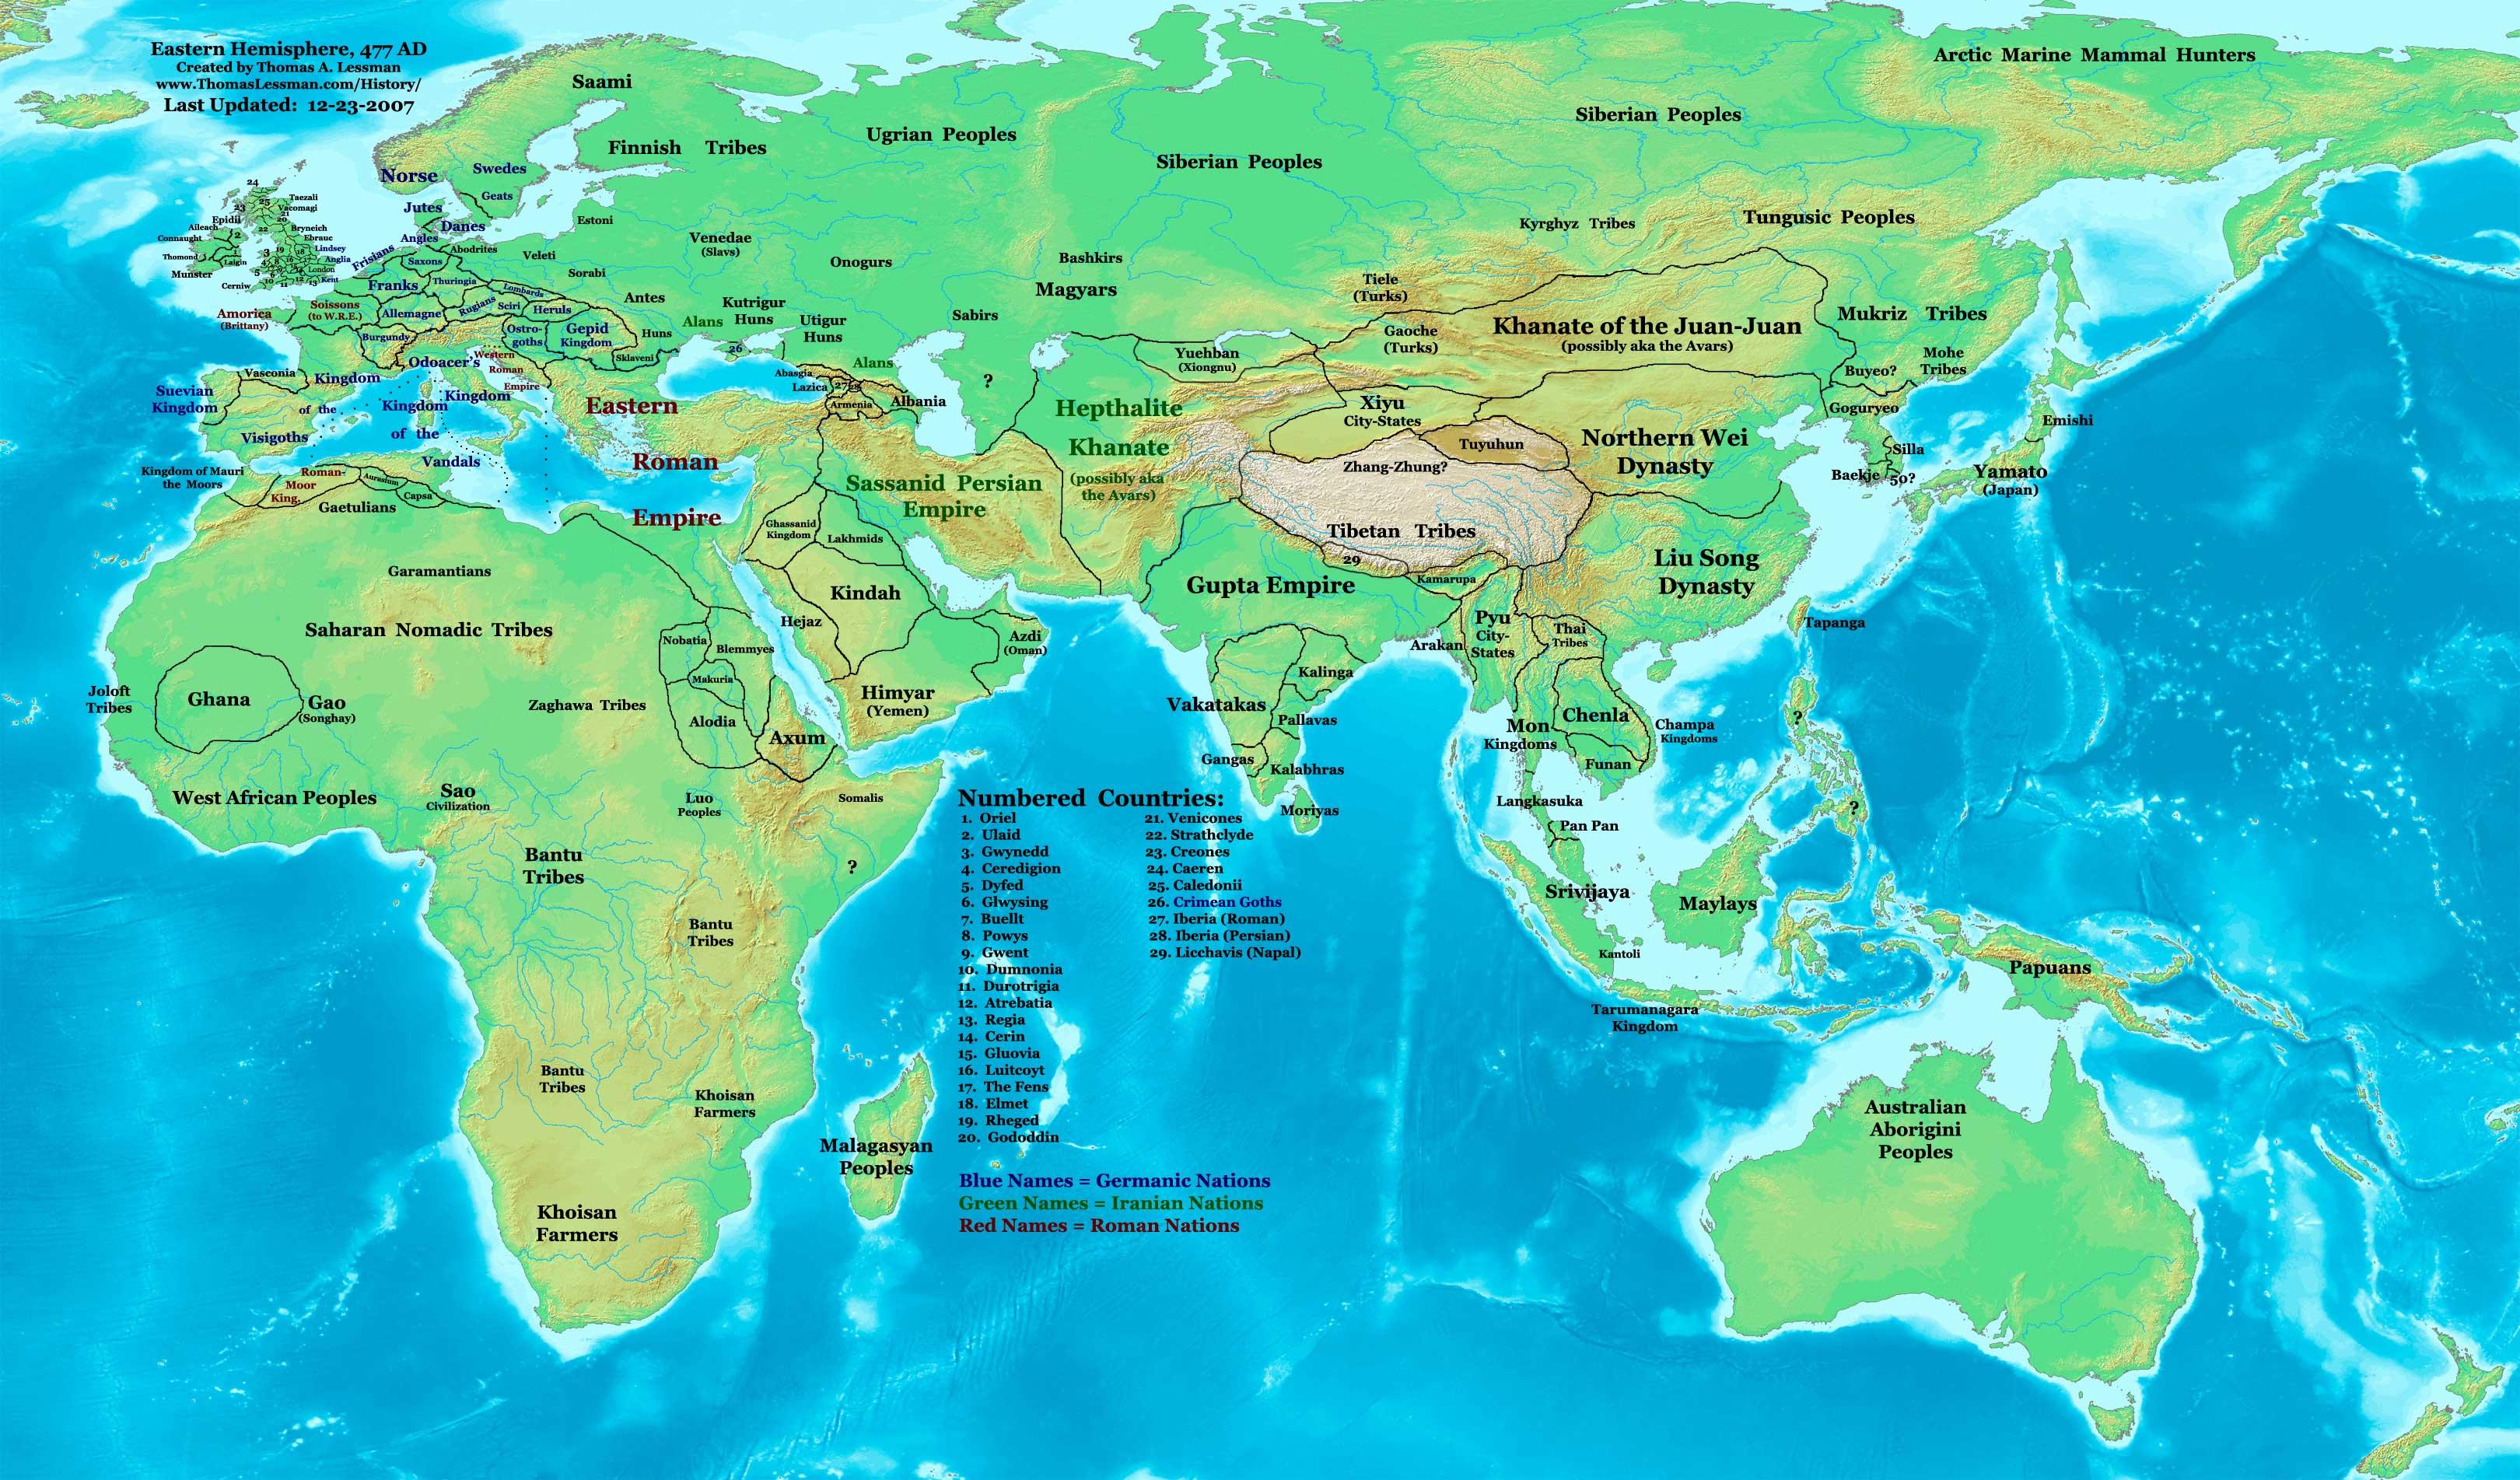 Eastern Hemisphere Map With Countries File:East-Hem 477ad.jp...